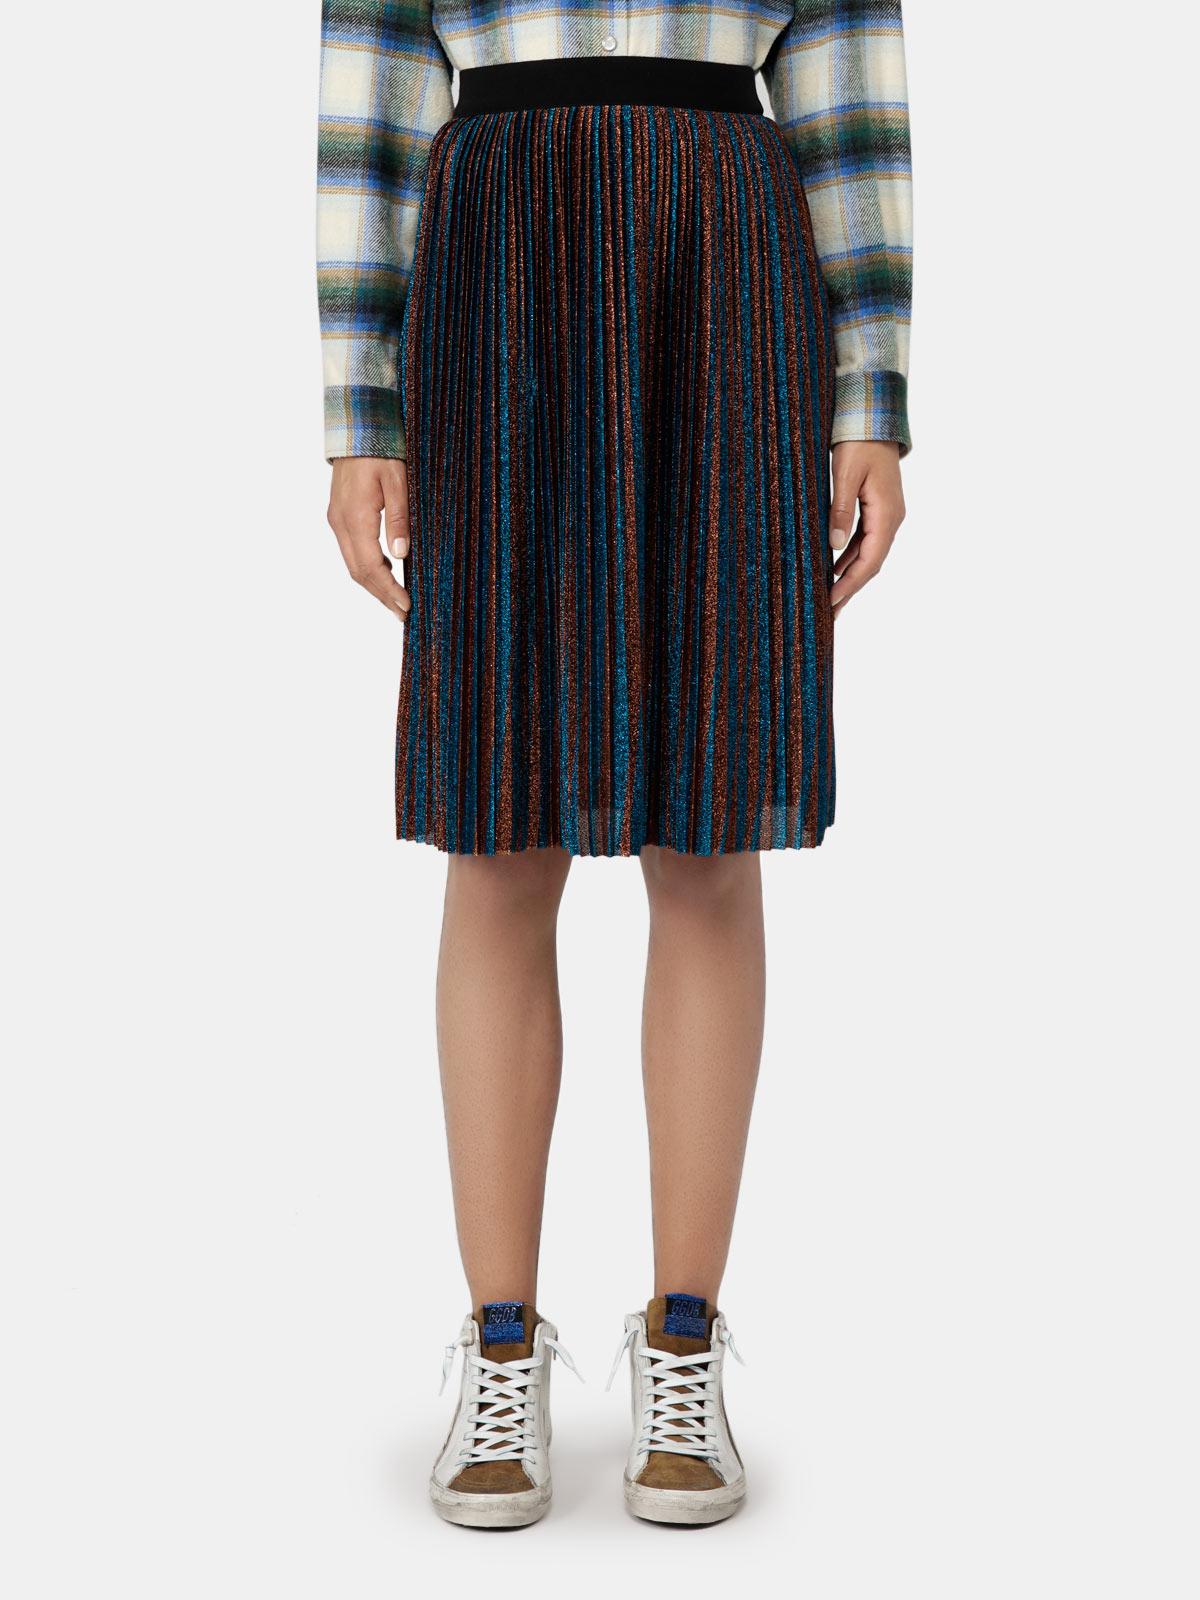 Golden Goose - Pleated Amber skirt in lurex in